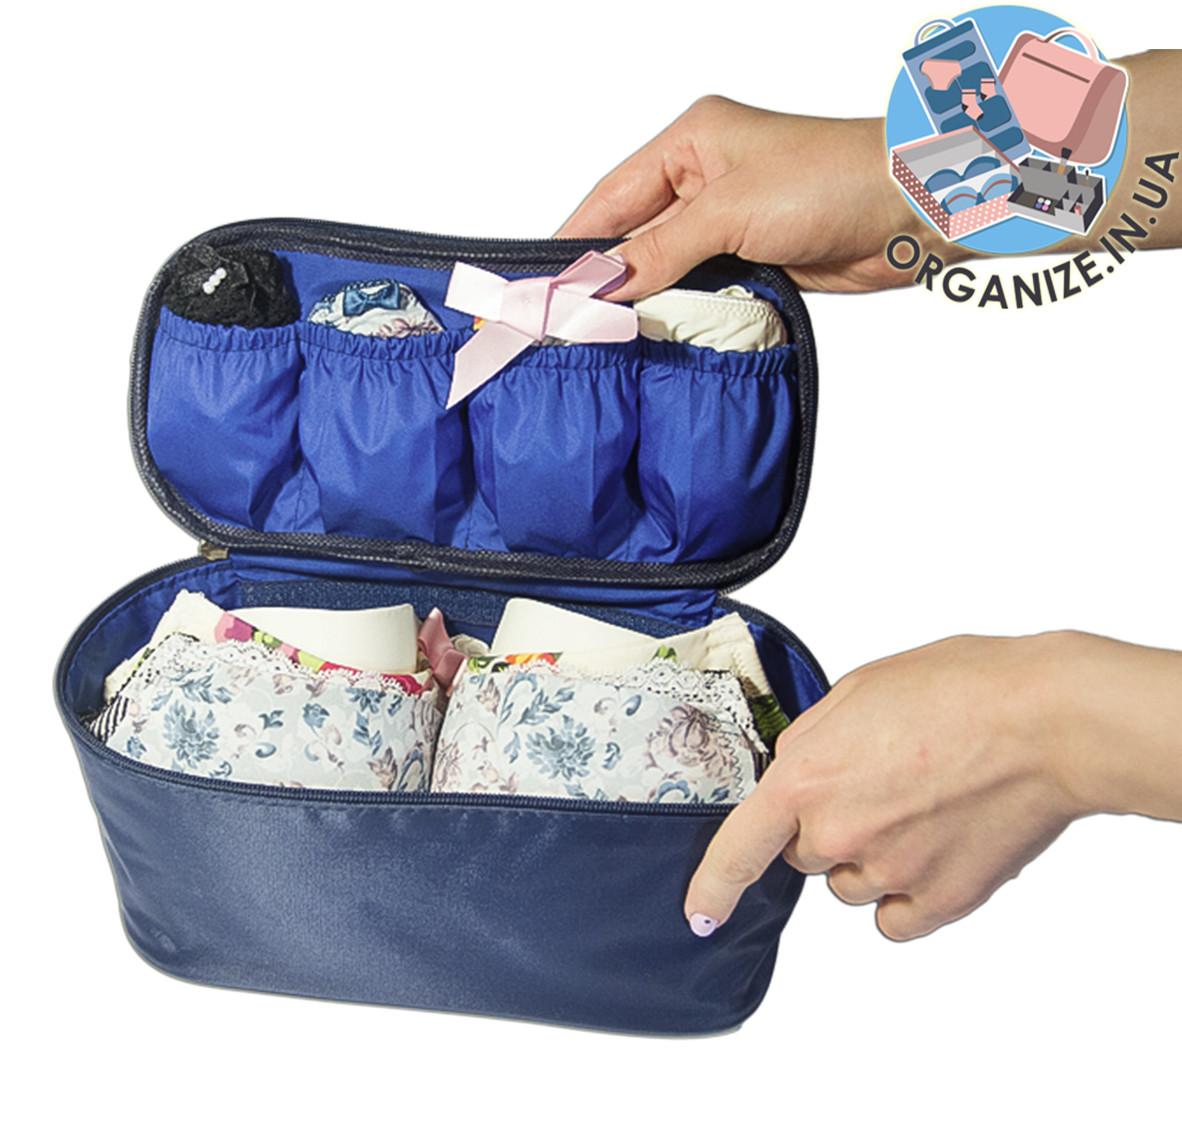 Органайзер для путешествий для белья ORGANIZE (синий)